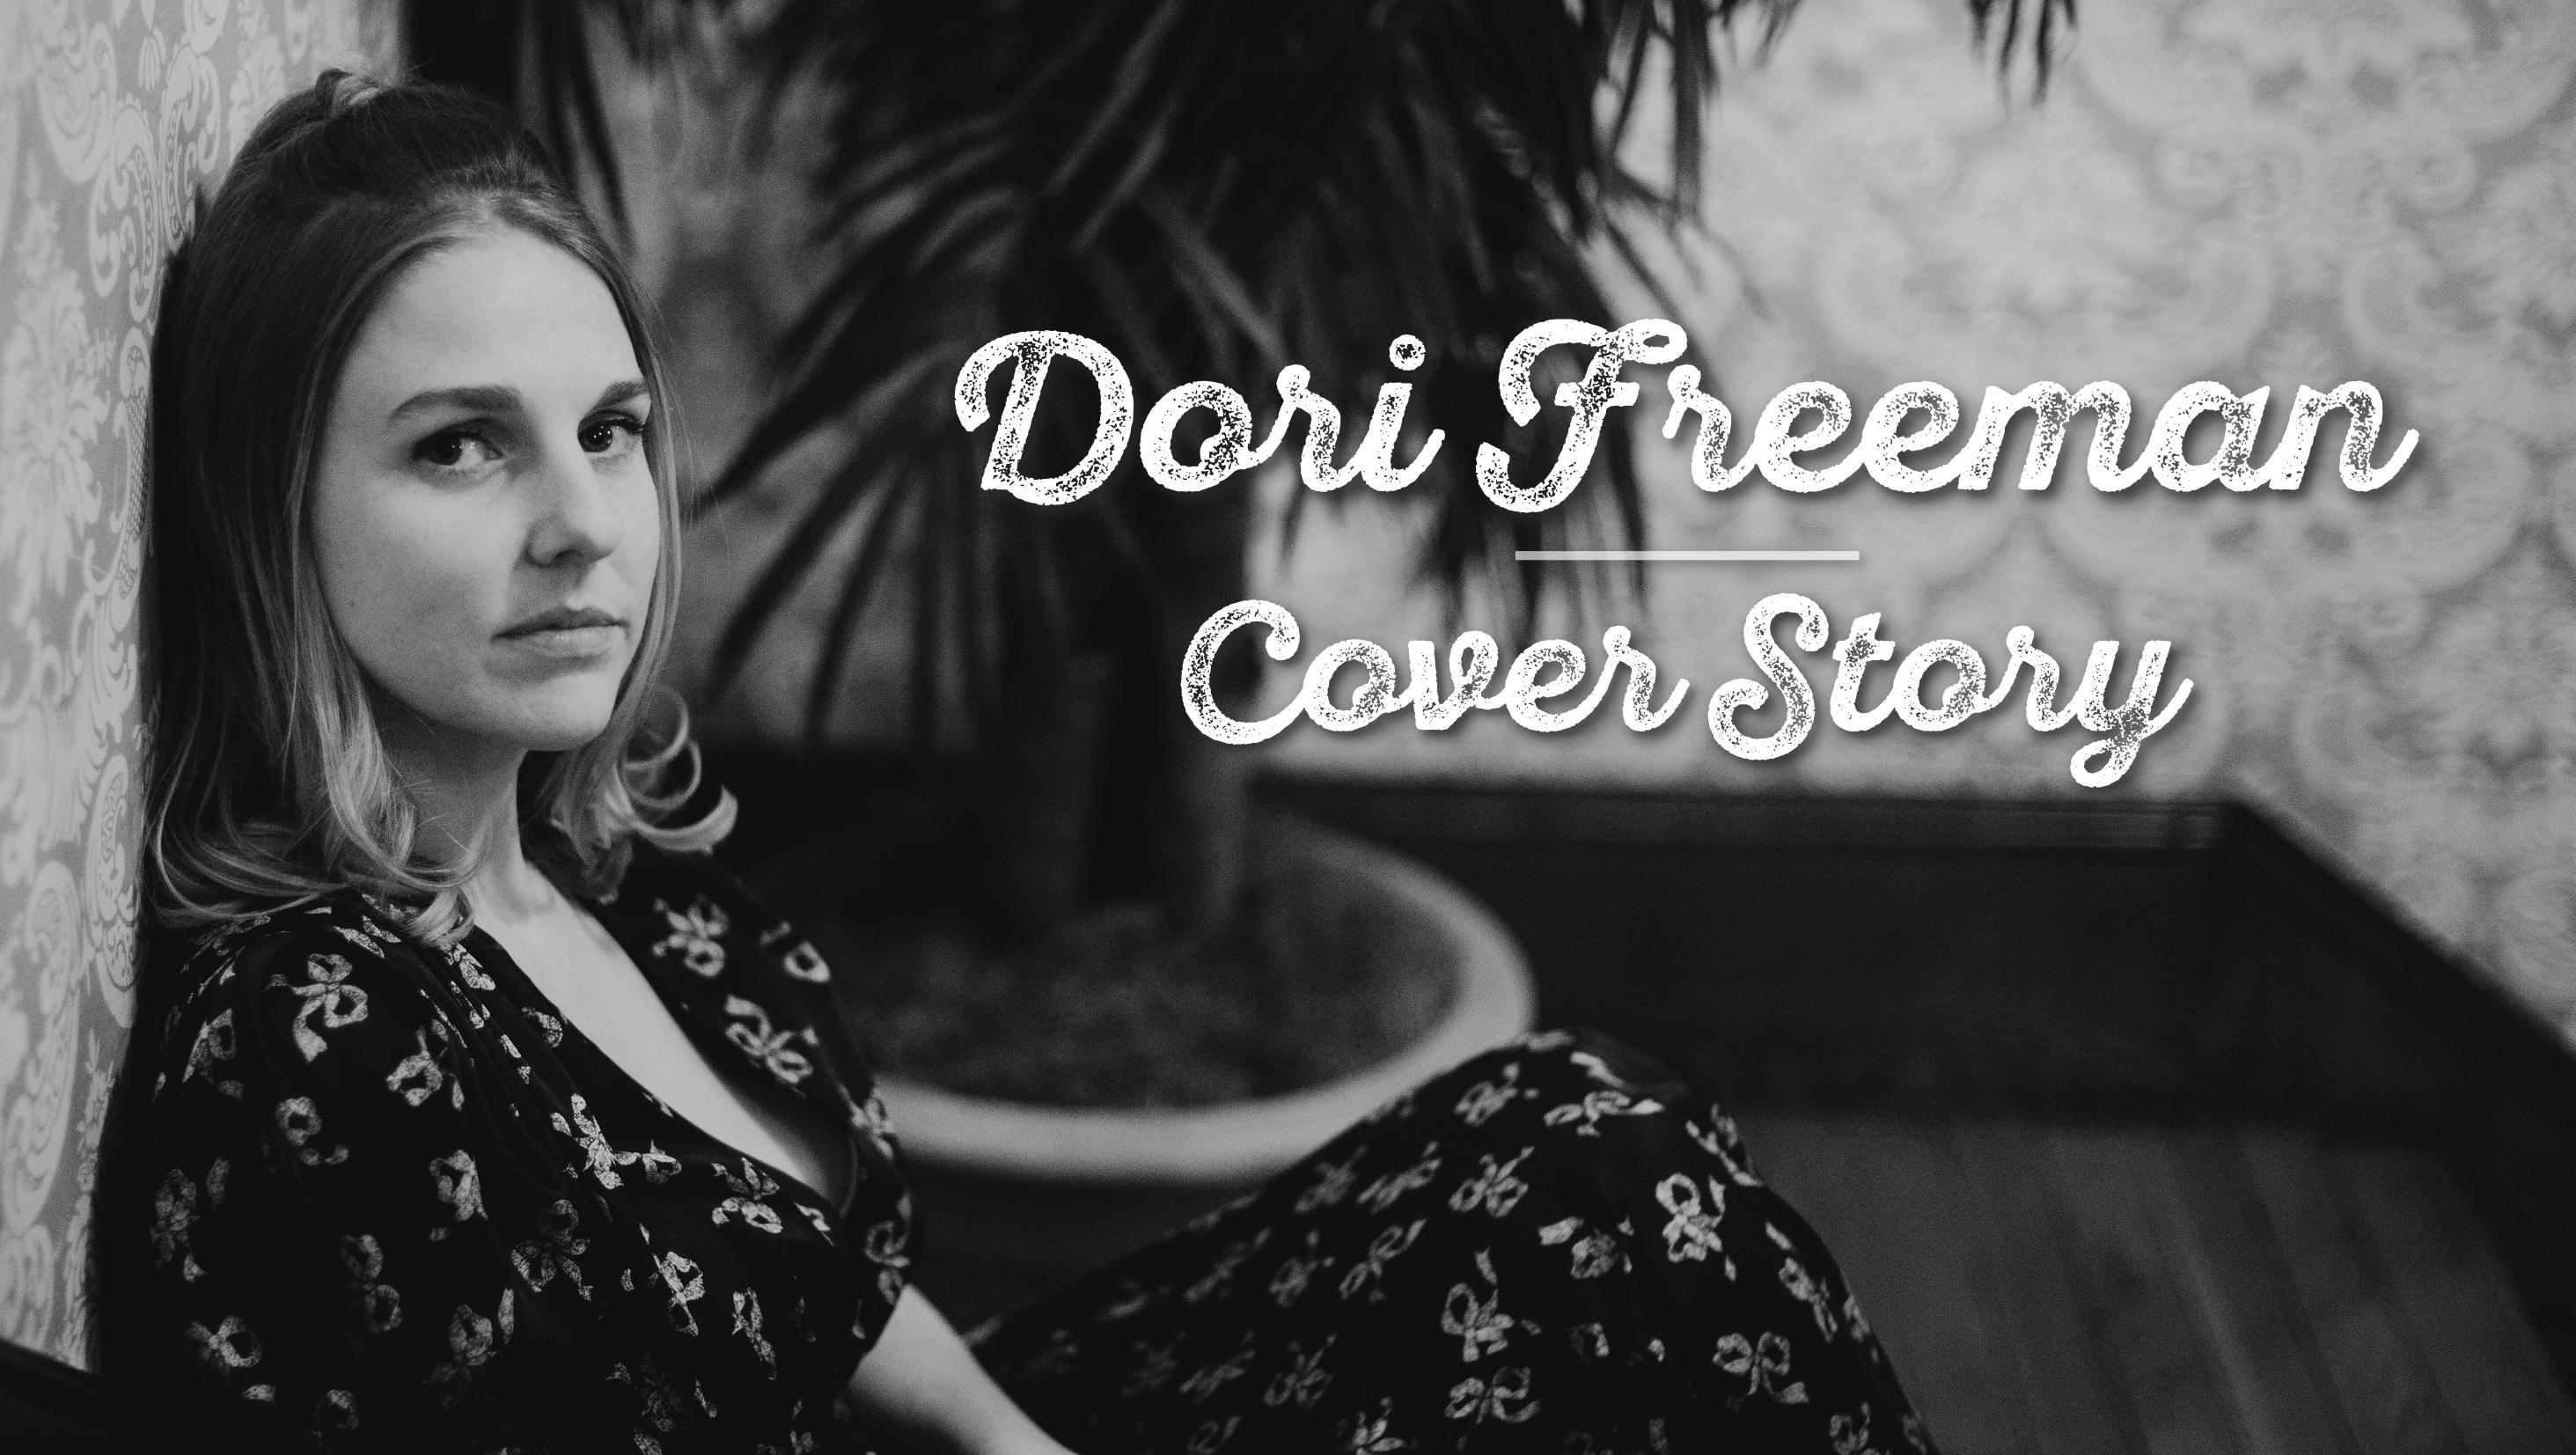 Dori Freeman: From Appalachian Roots to 'Every Single Star'